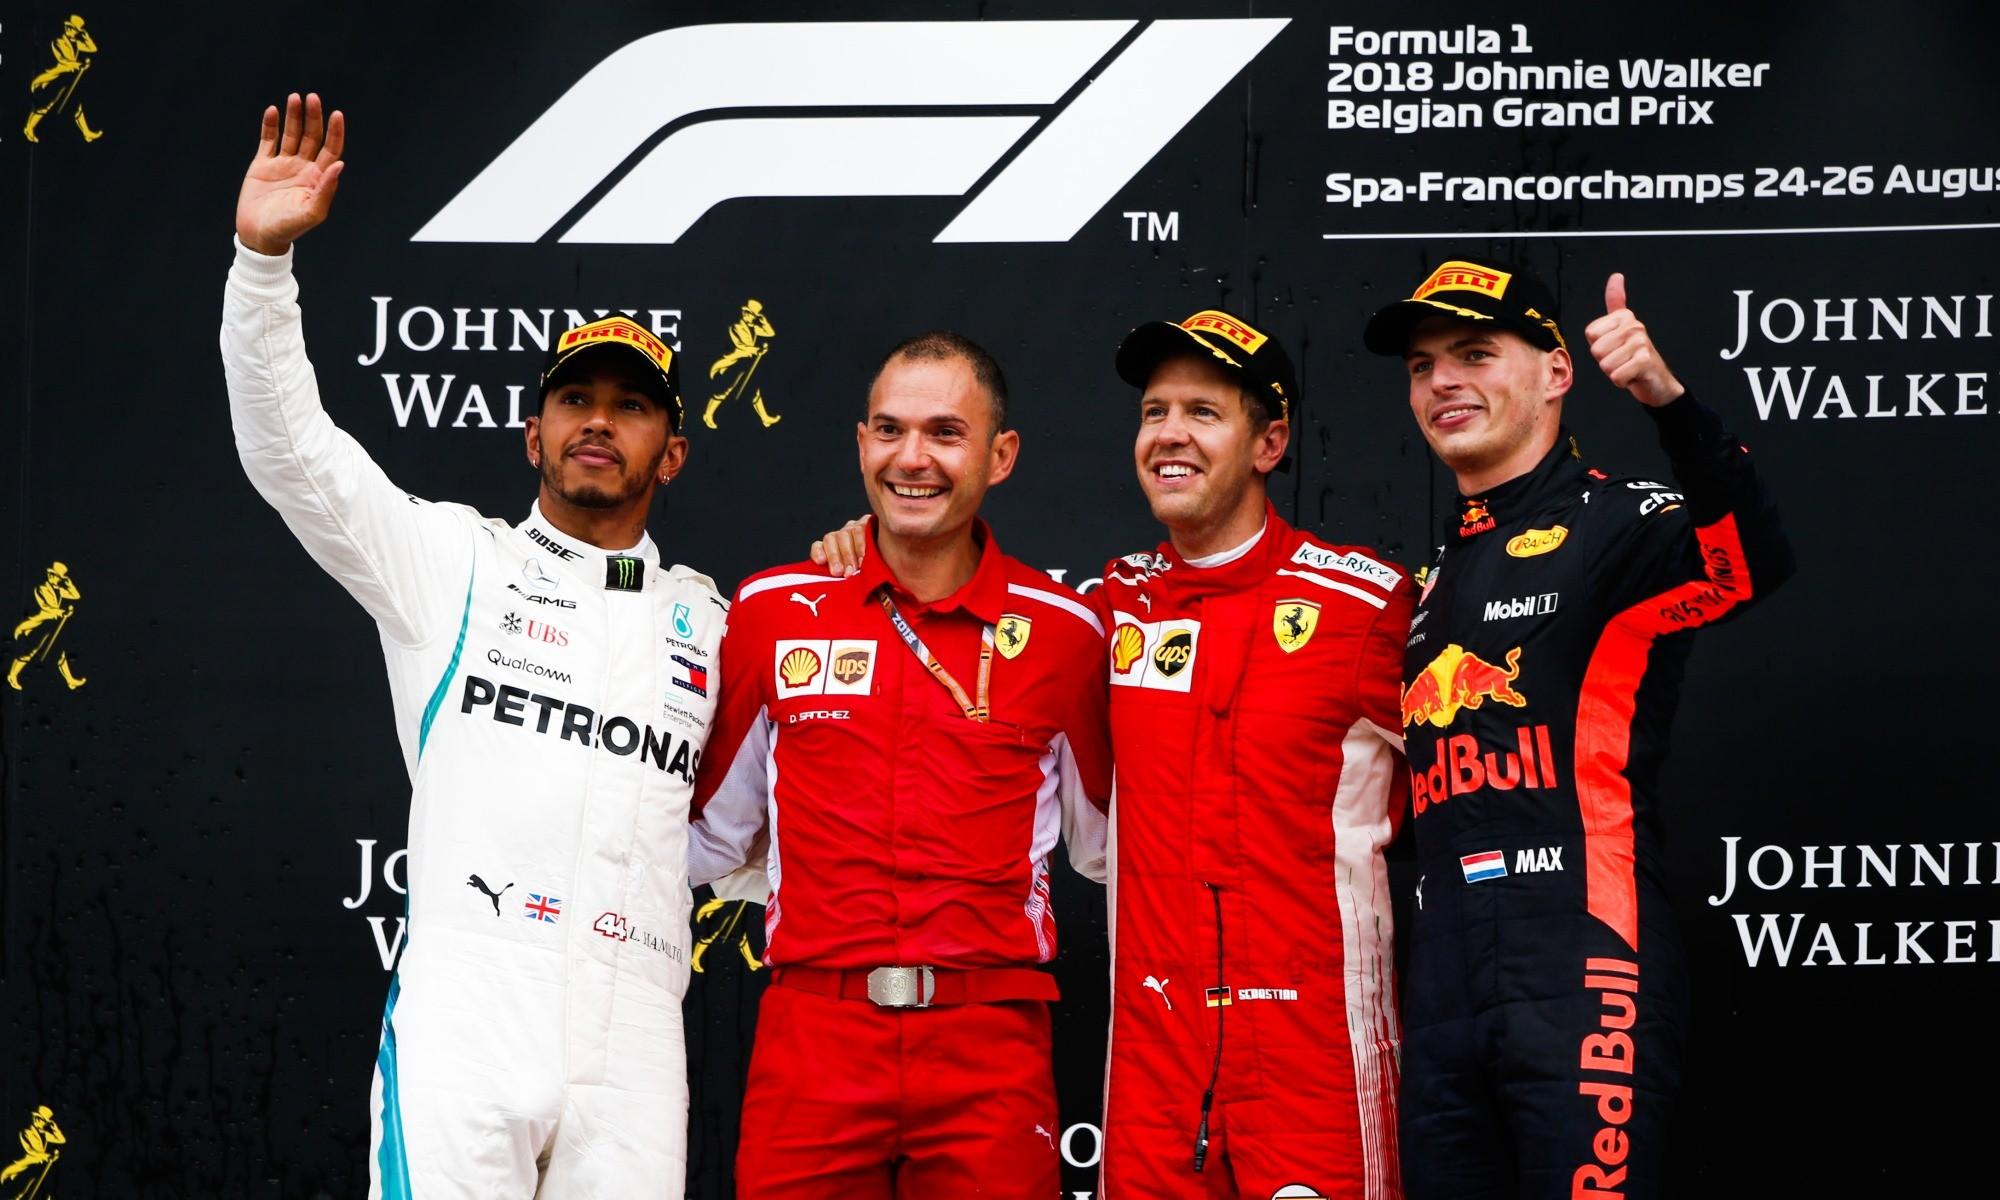 Sebastian Vettel won the Belgian Grand Prix